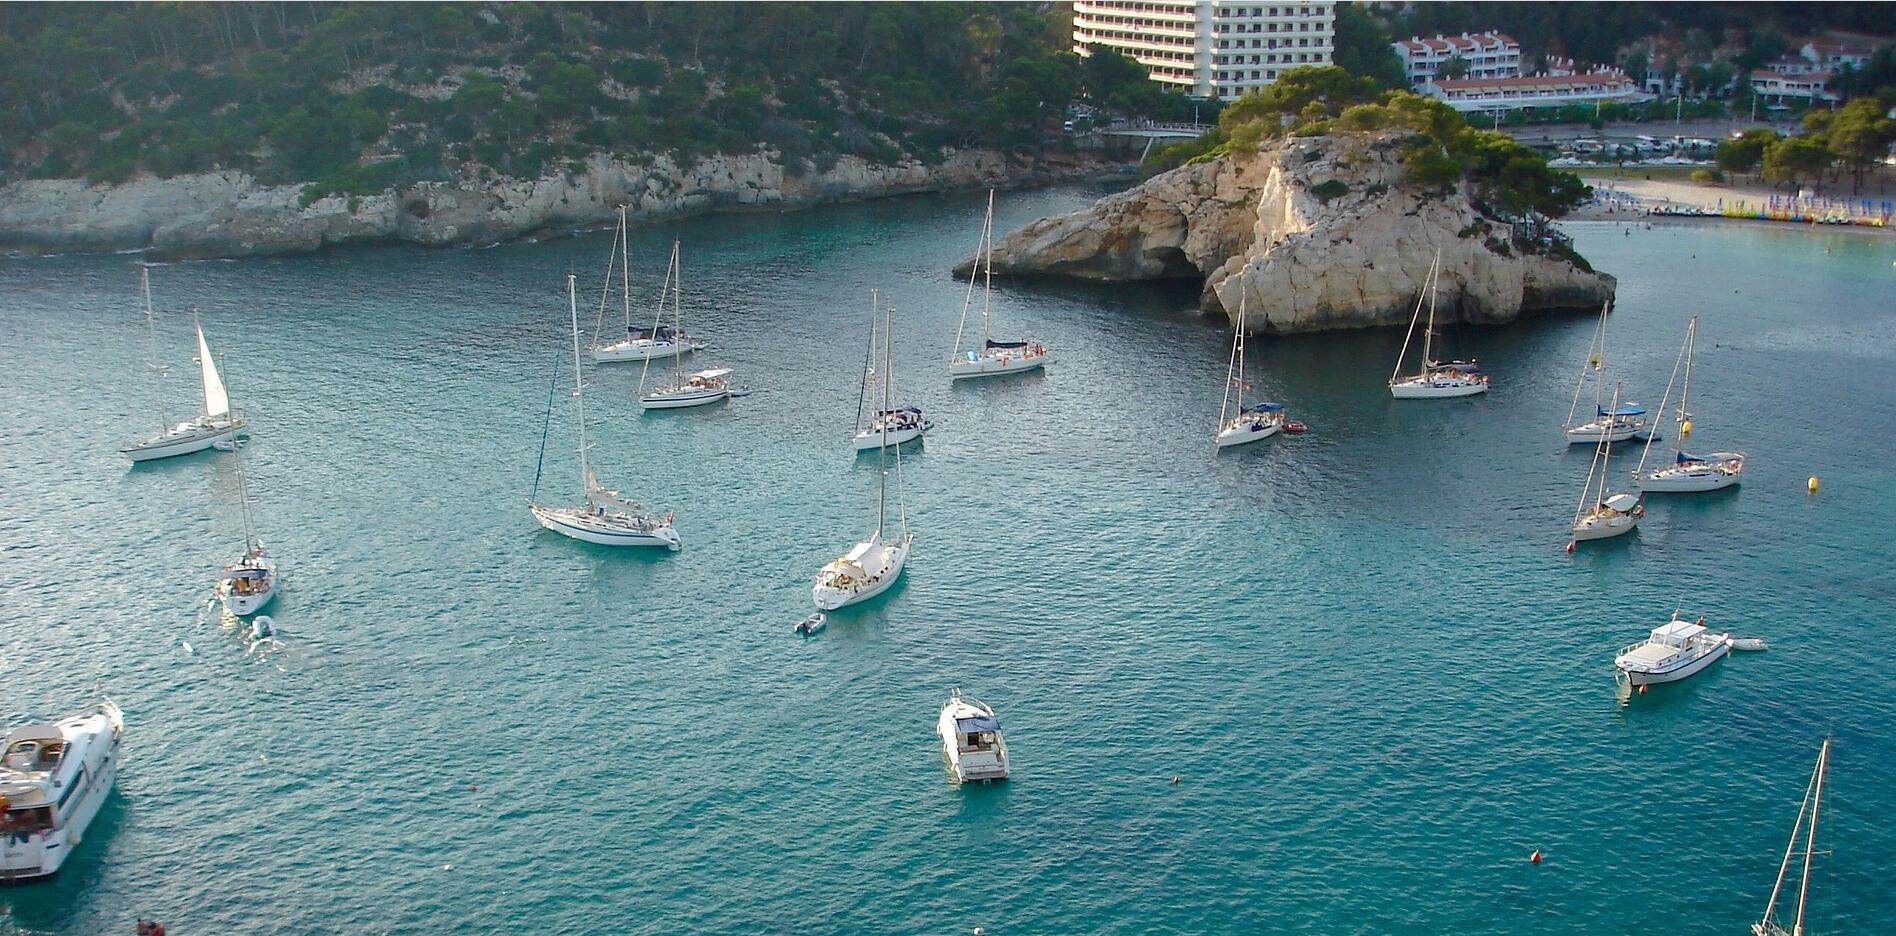 Cala Galdana - one of Menorca's best travel destinations